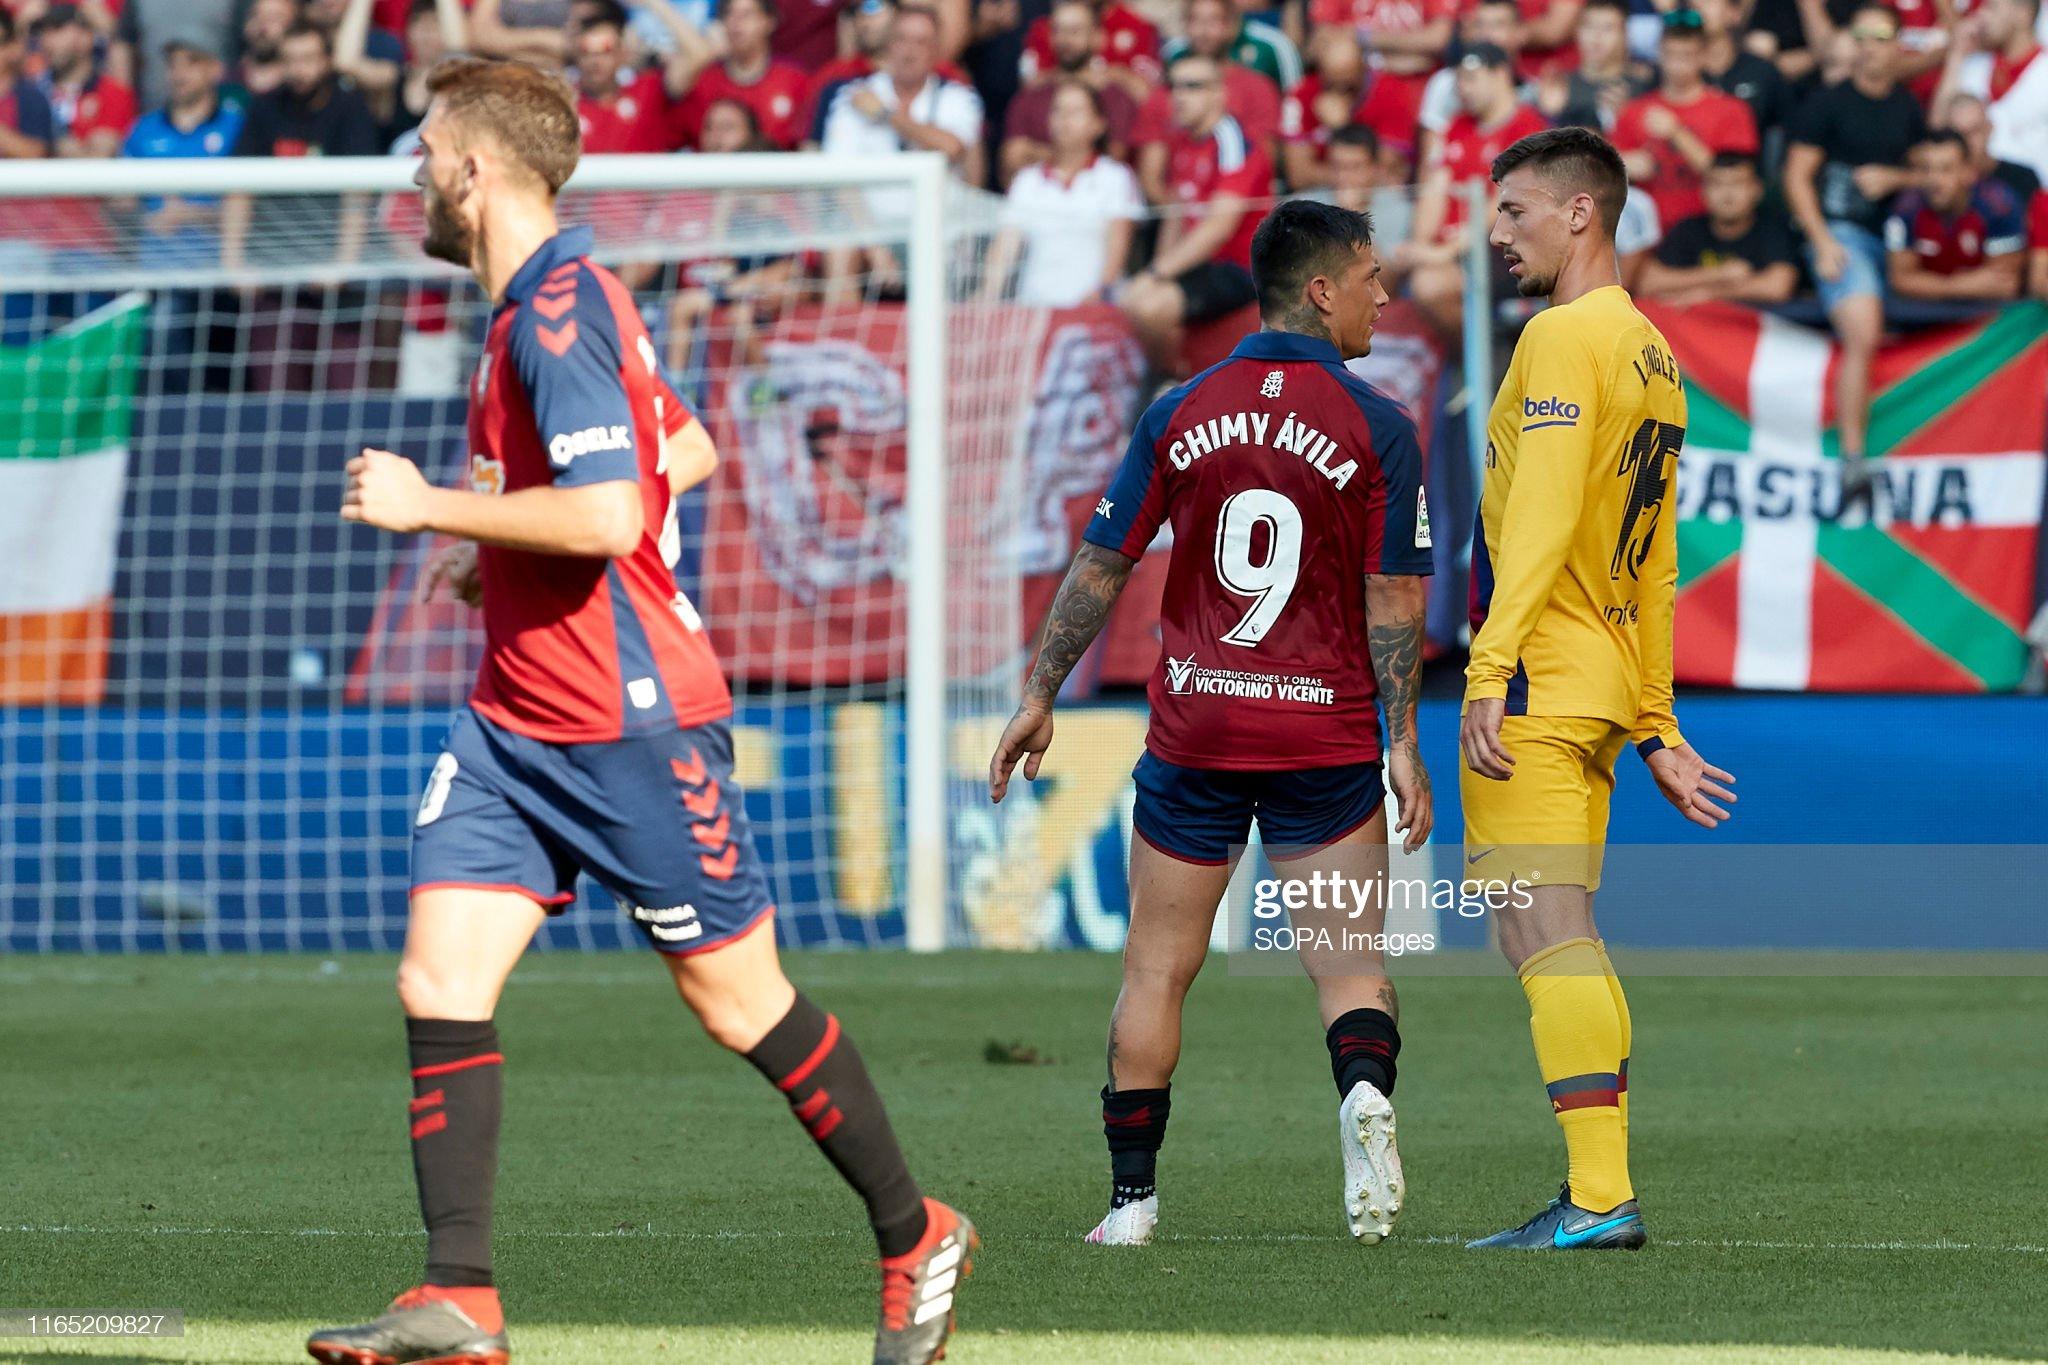 صور مباراة : أوساسونا - برشلونة 2-2 ( 31-08-2019 )  Chimy-avila-and-clement-lenglet-in-action-during-the-spanish-la-liga-picture-id1165209827?s=2048x2048